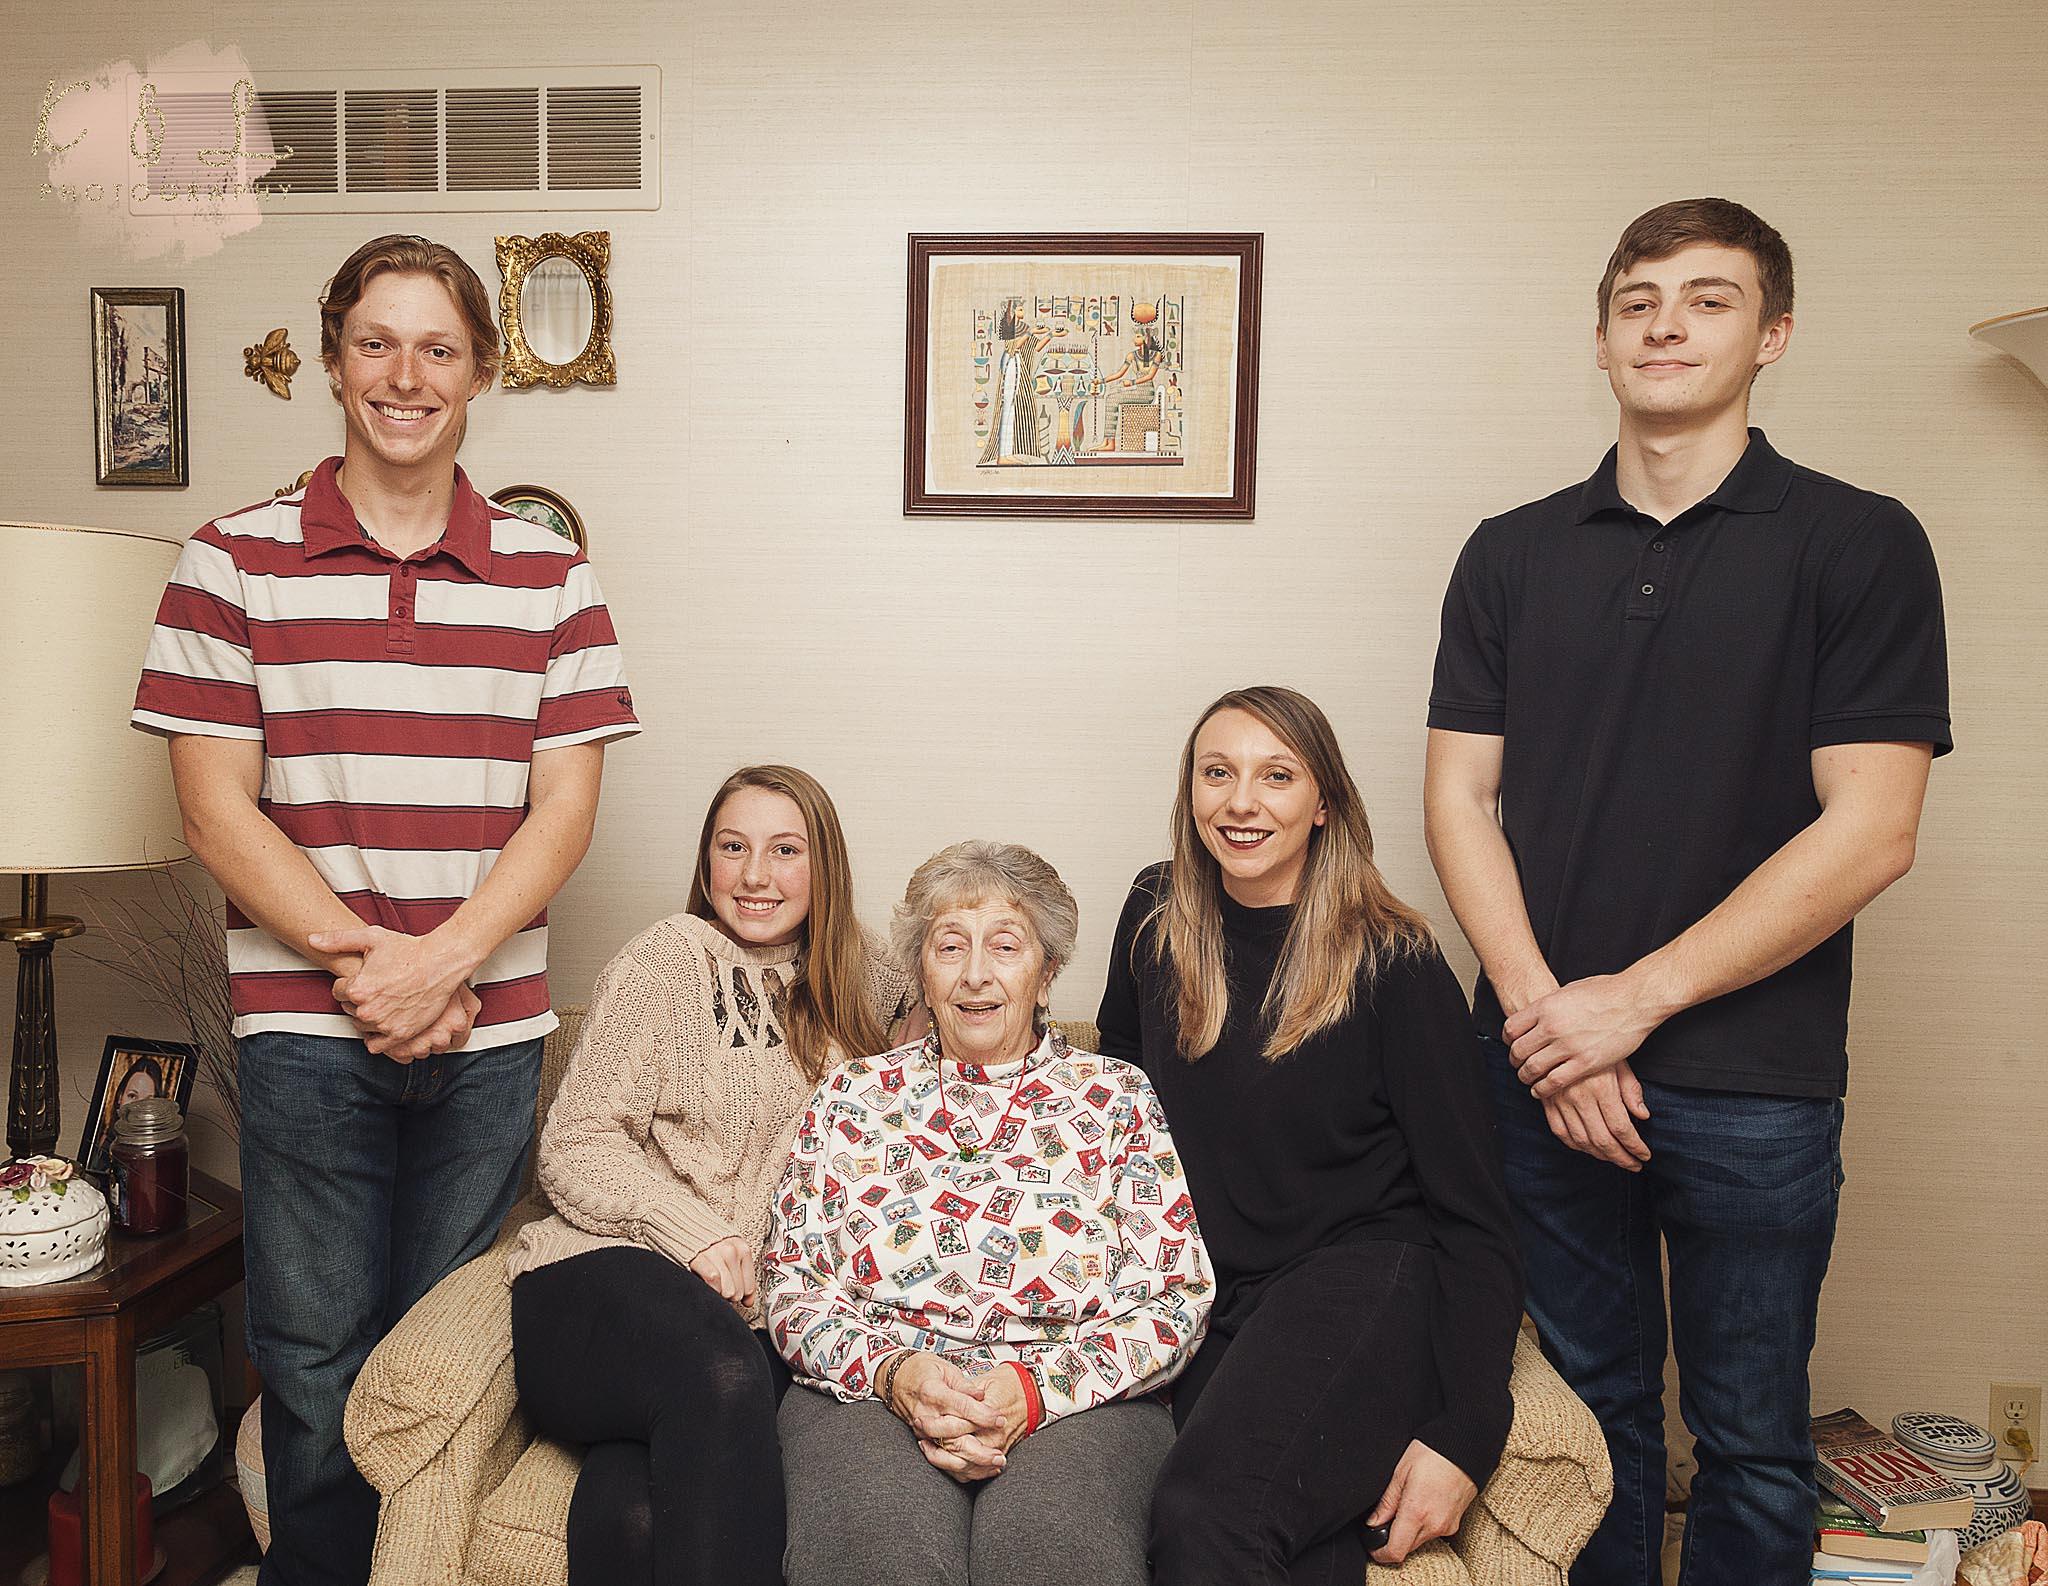 Nana and the grandkids